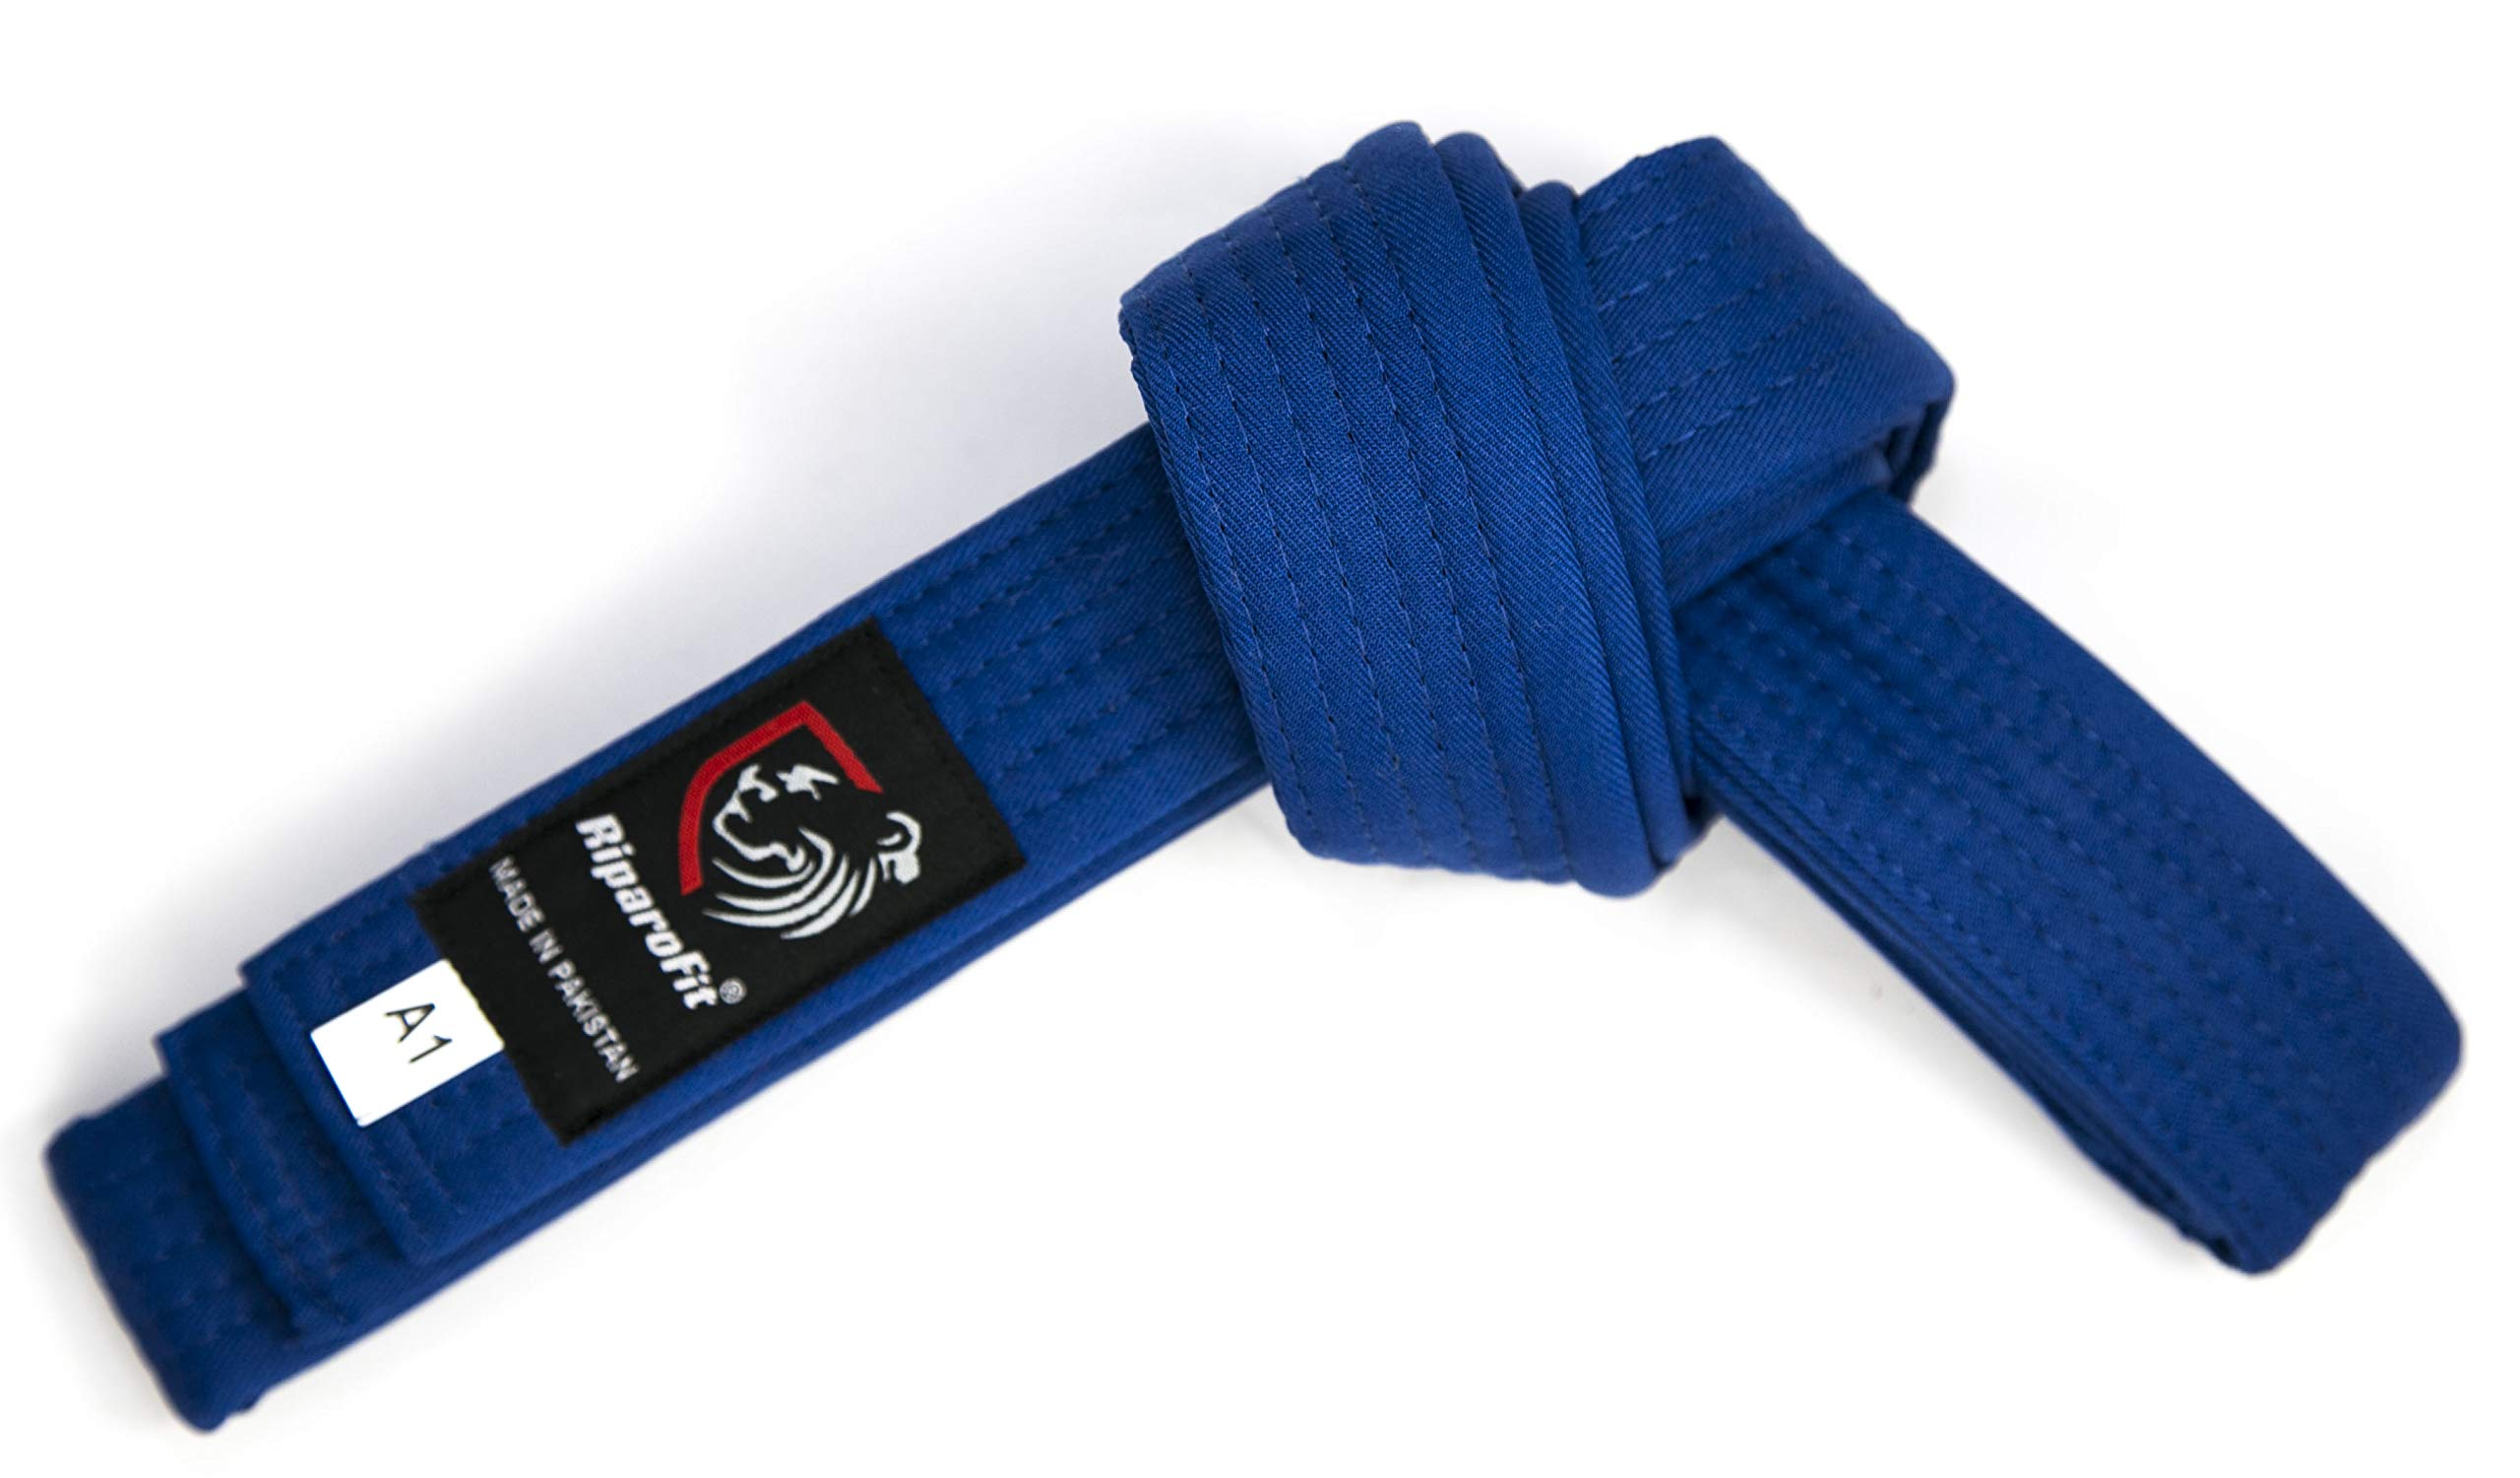 RiparoFit Brazilian Jiu Jitsu BJJ Pro Belts (Blue, K2) by RiparoFit